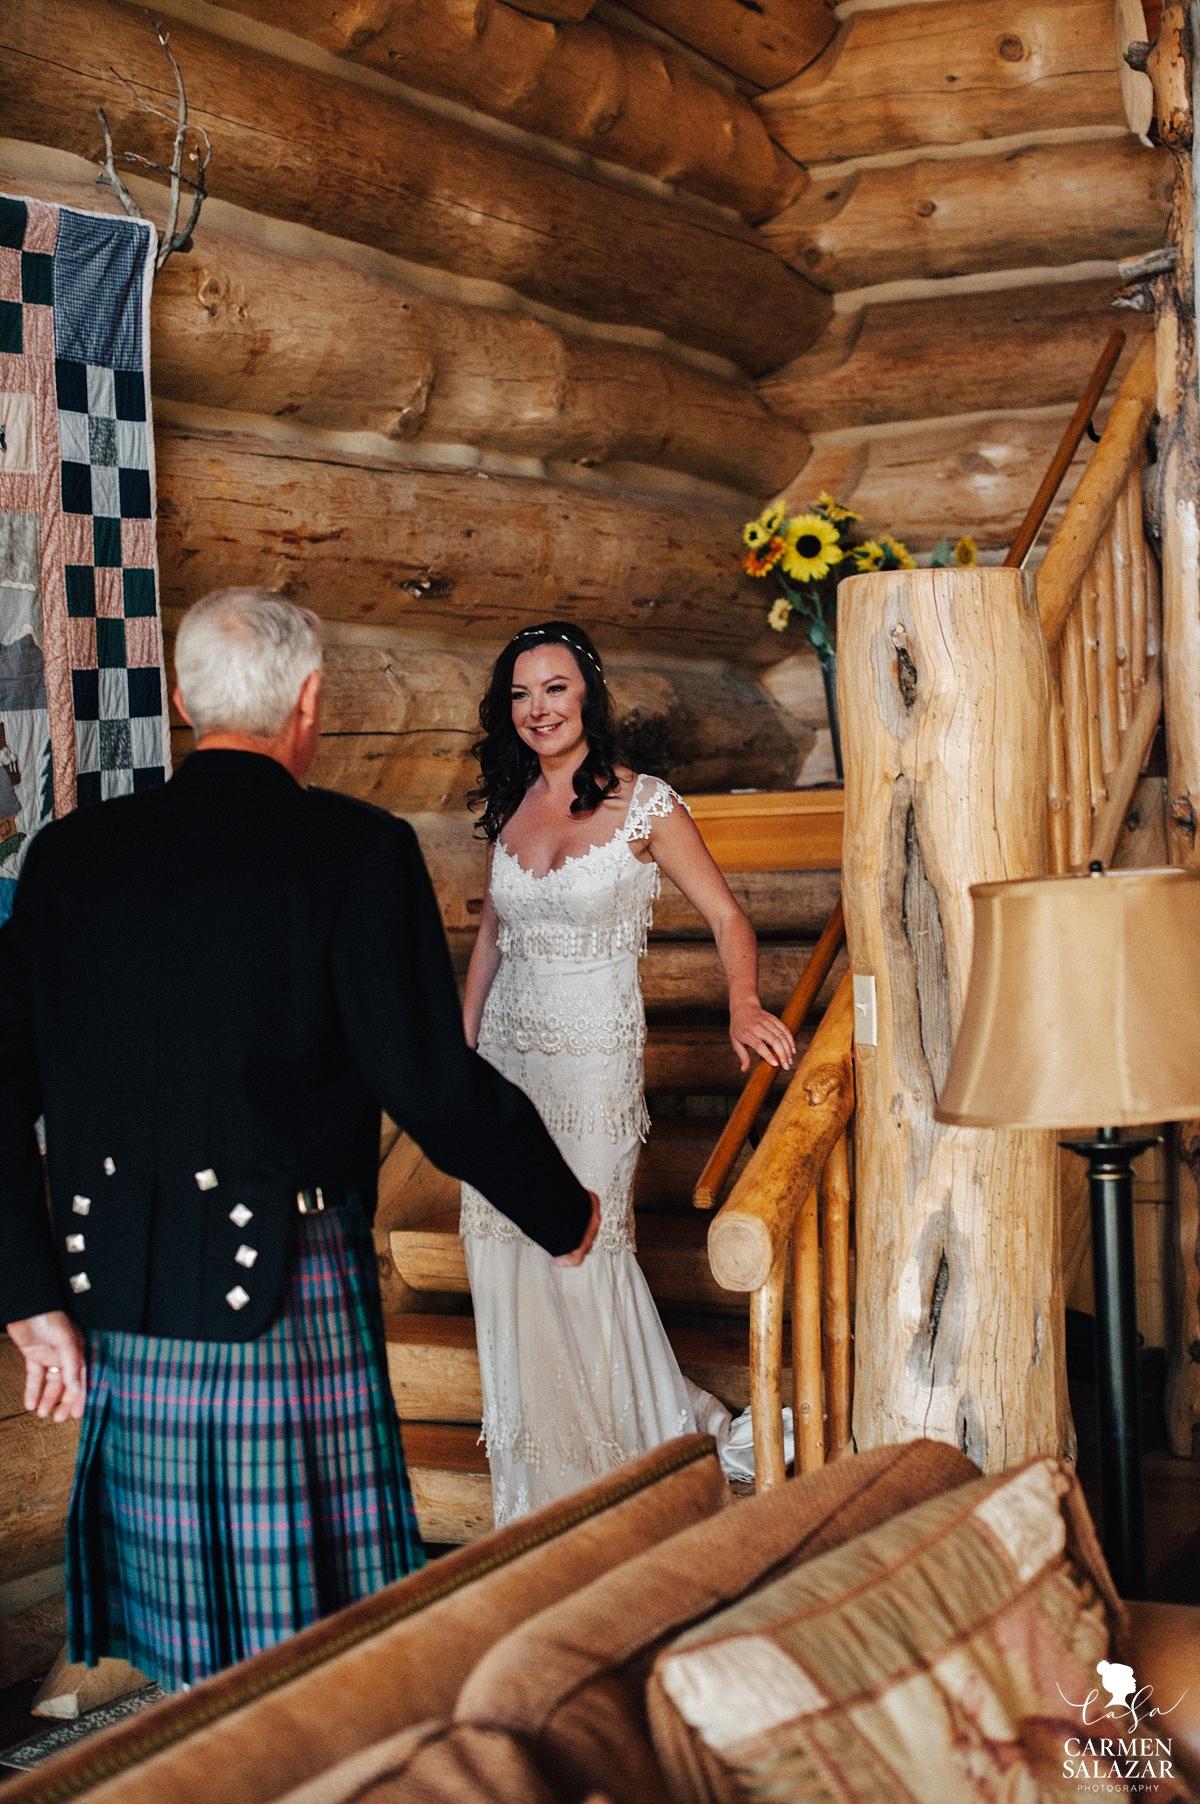 Bride seeing father before ceremony - Carmen Salazar